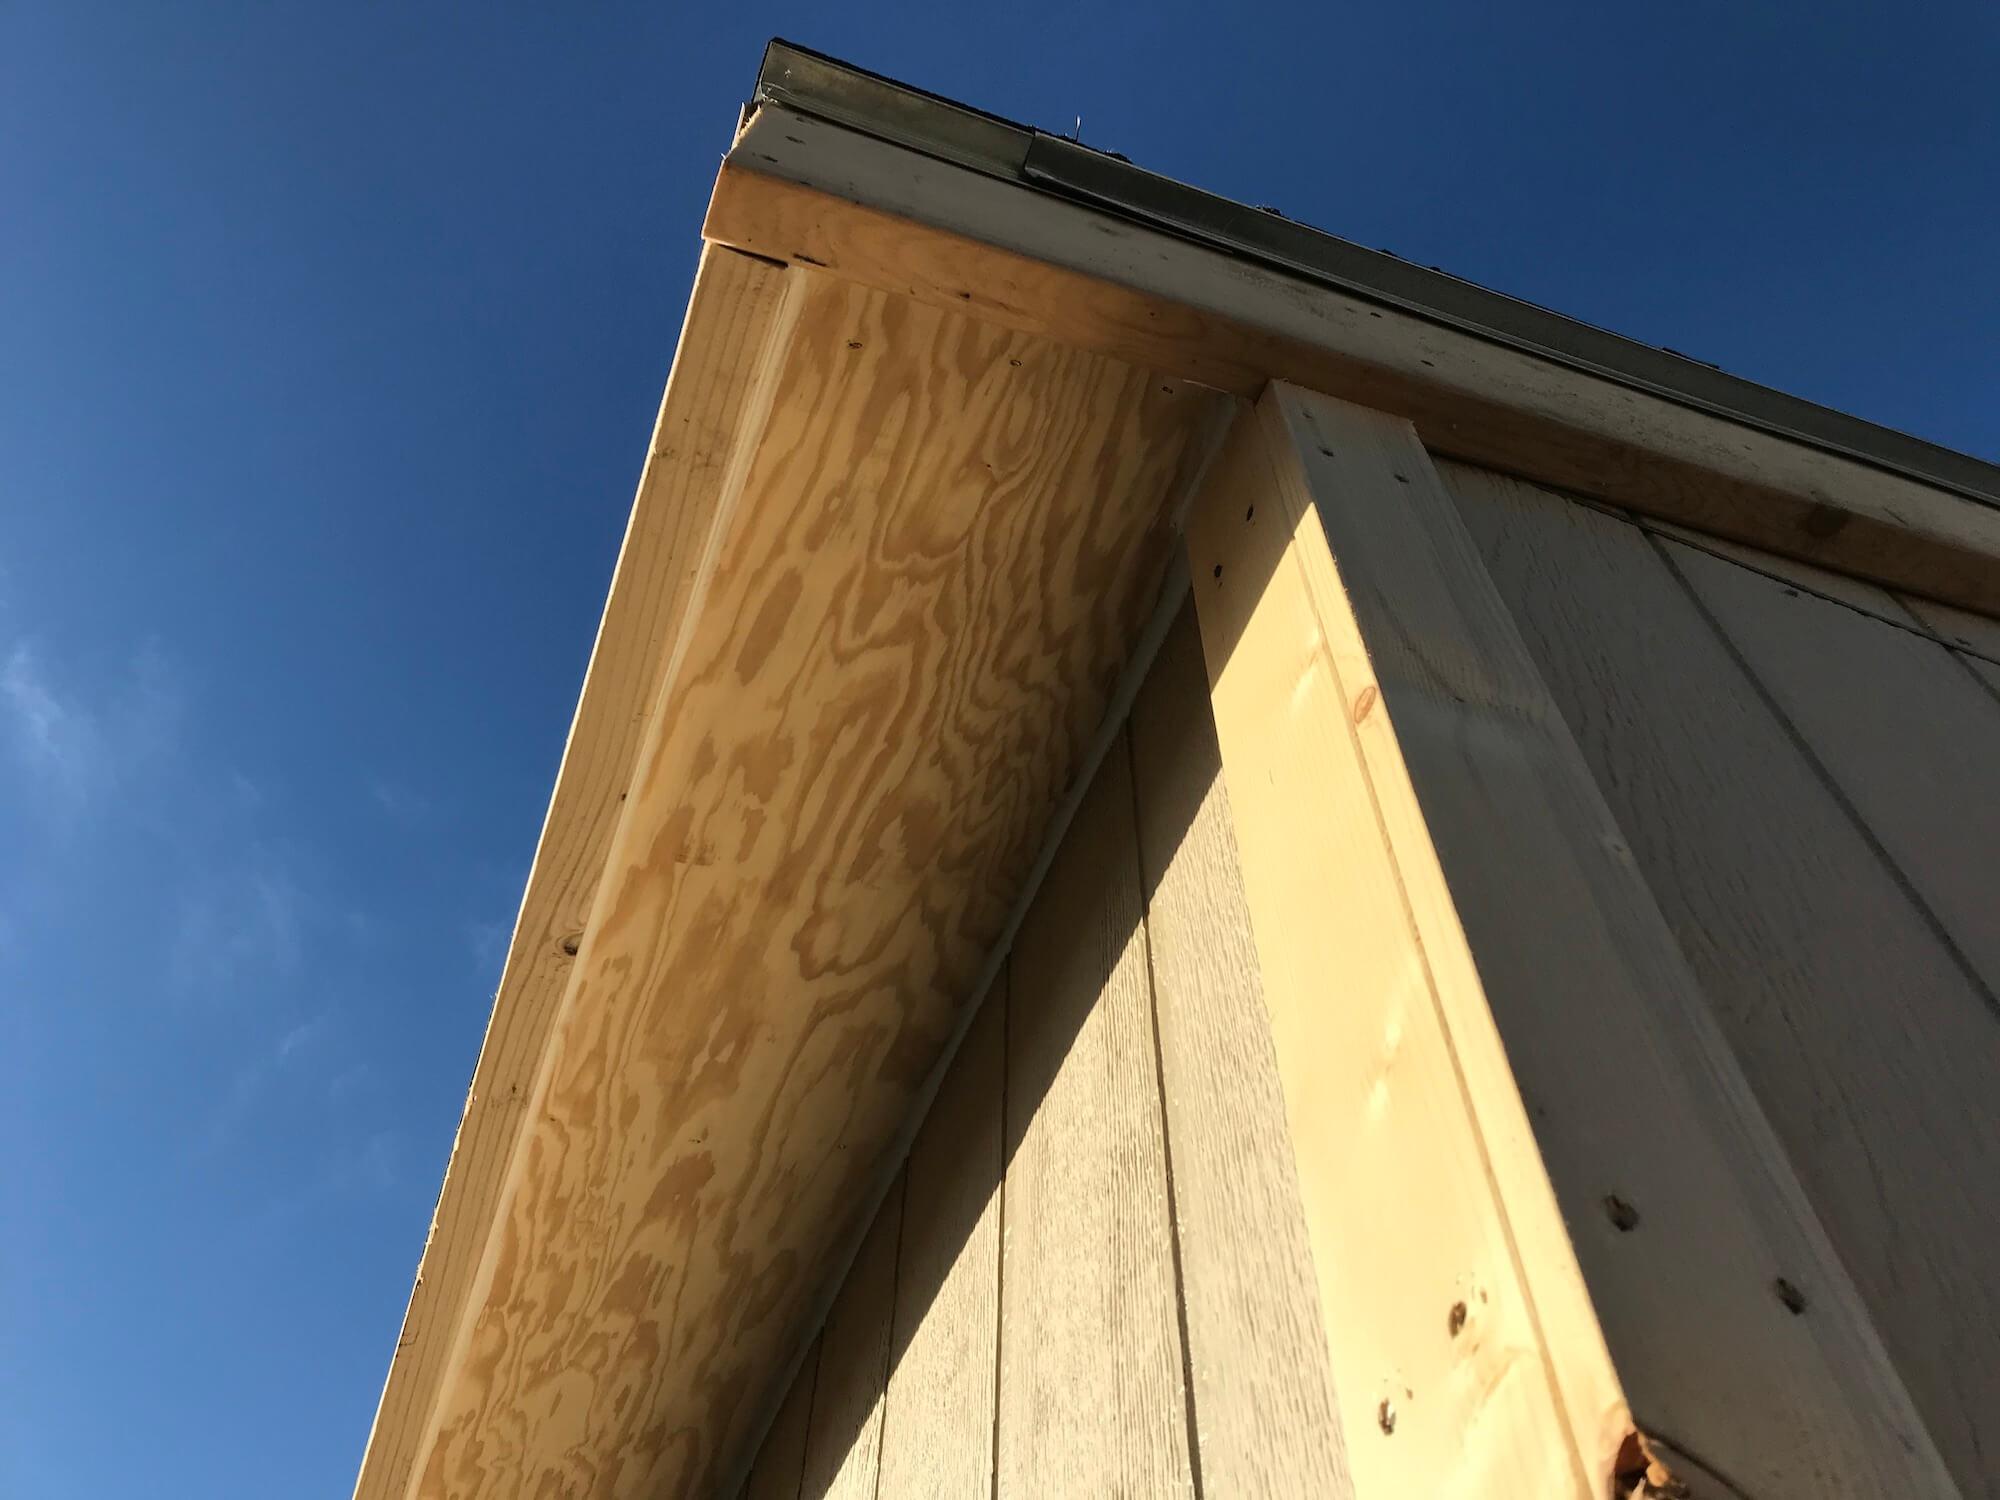 2018-10-25 Builders FirstSource Pre-Built Sheds3.jpg